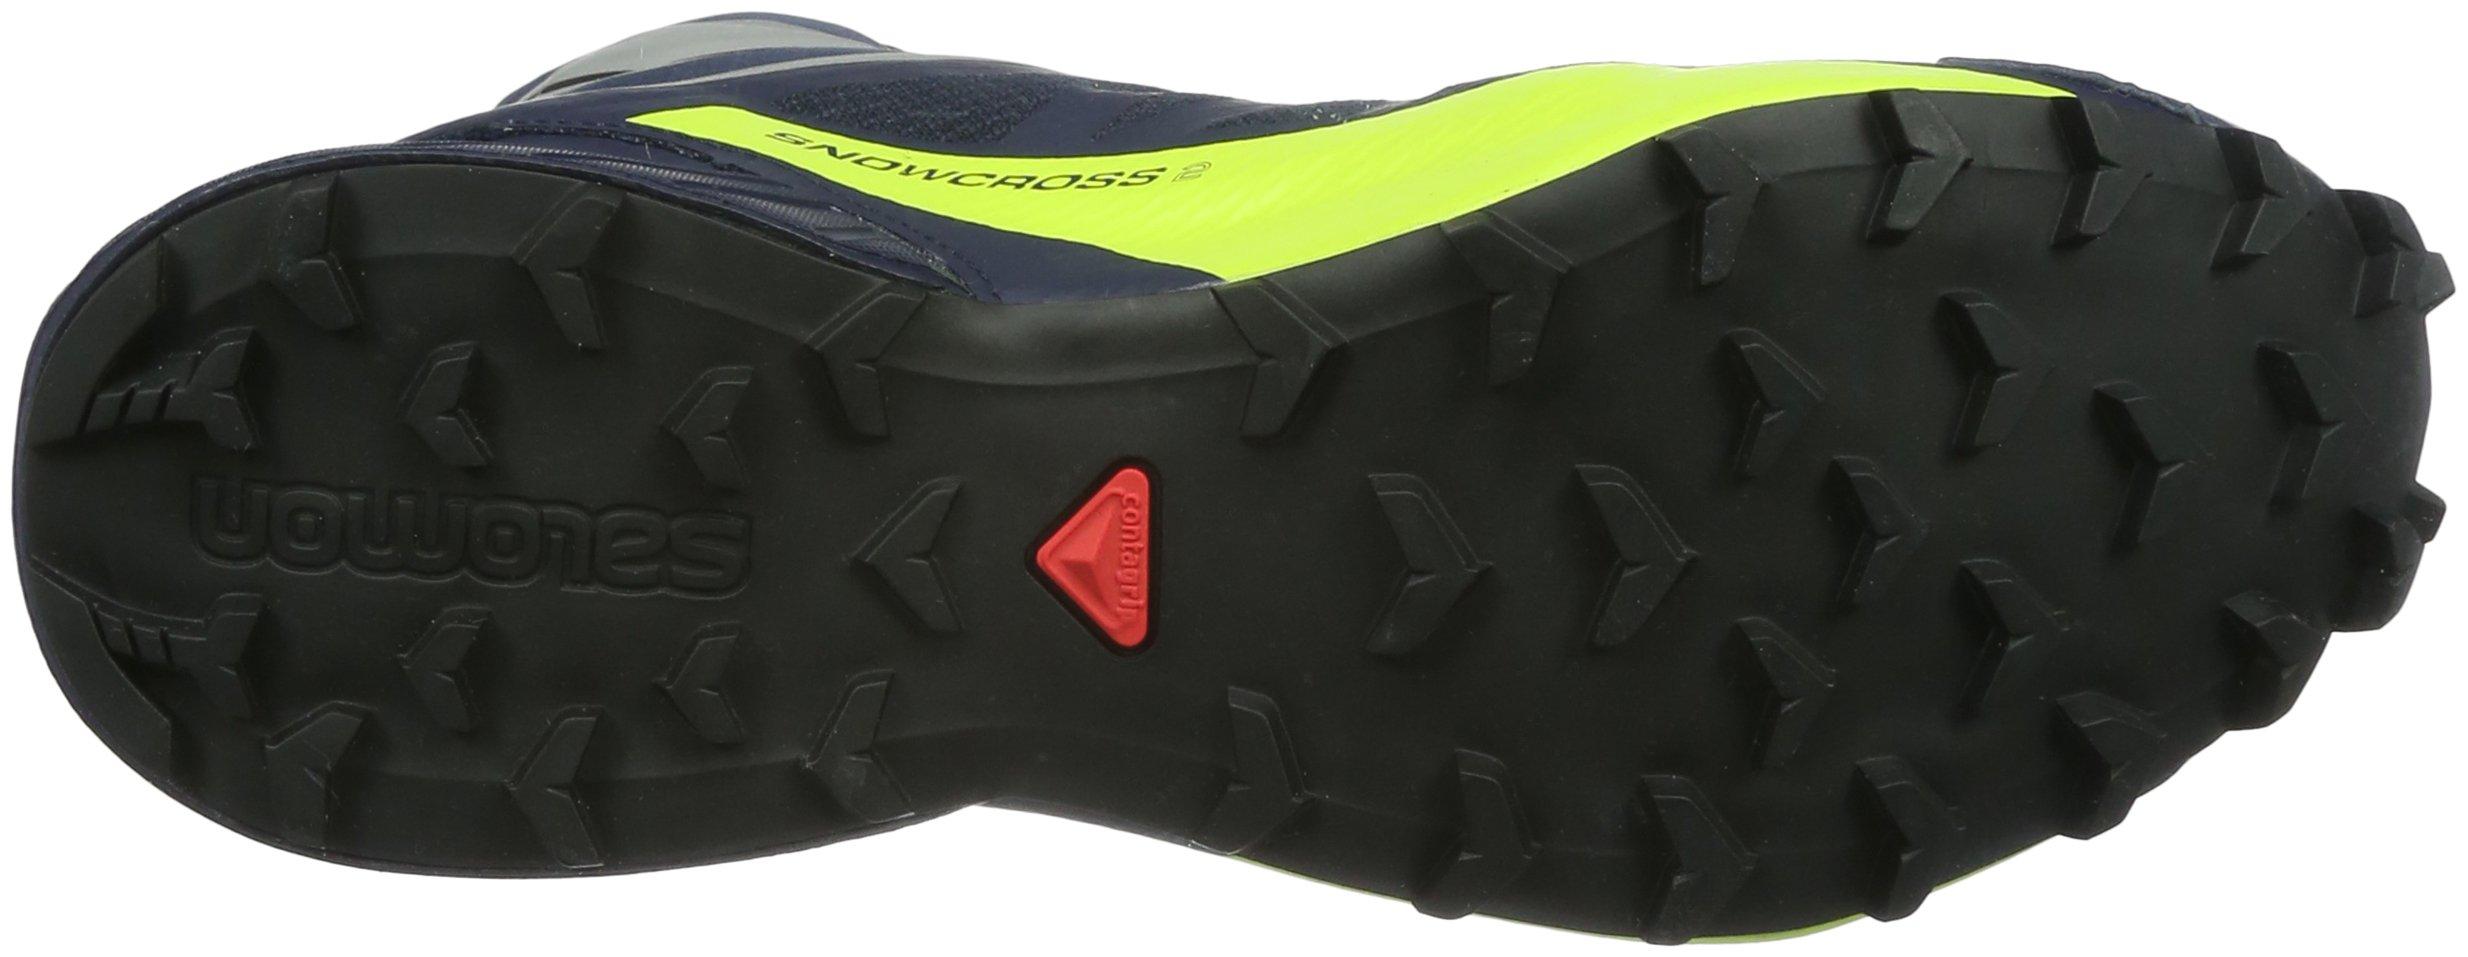 Salomon Snowcross 2 CS Waterproof Trail Running Shoe - Men's-Navy Blazer/Reflective L39451200-8.5 by Salomon (Image #3)